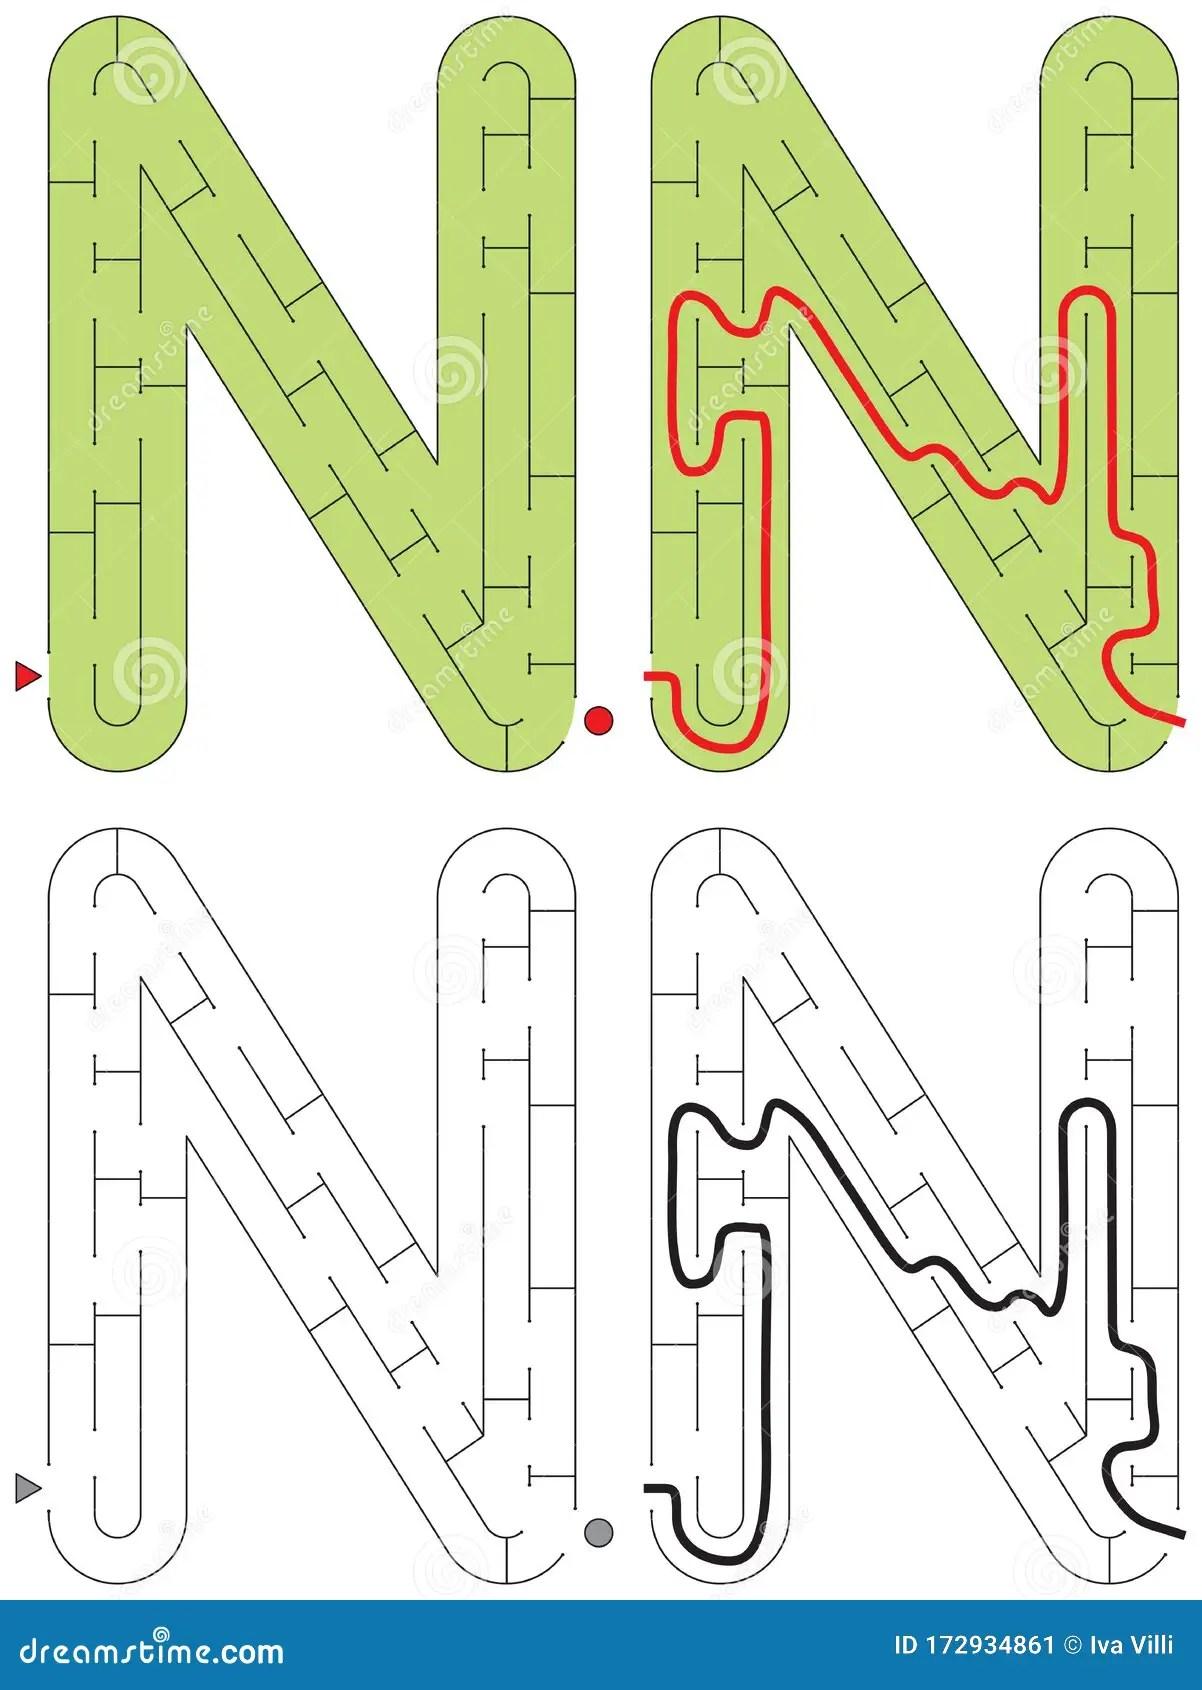 Easy Alphabet Maze